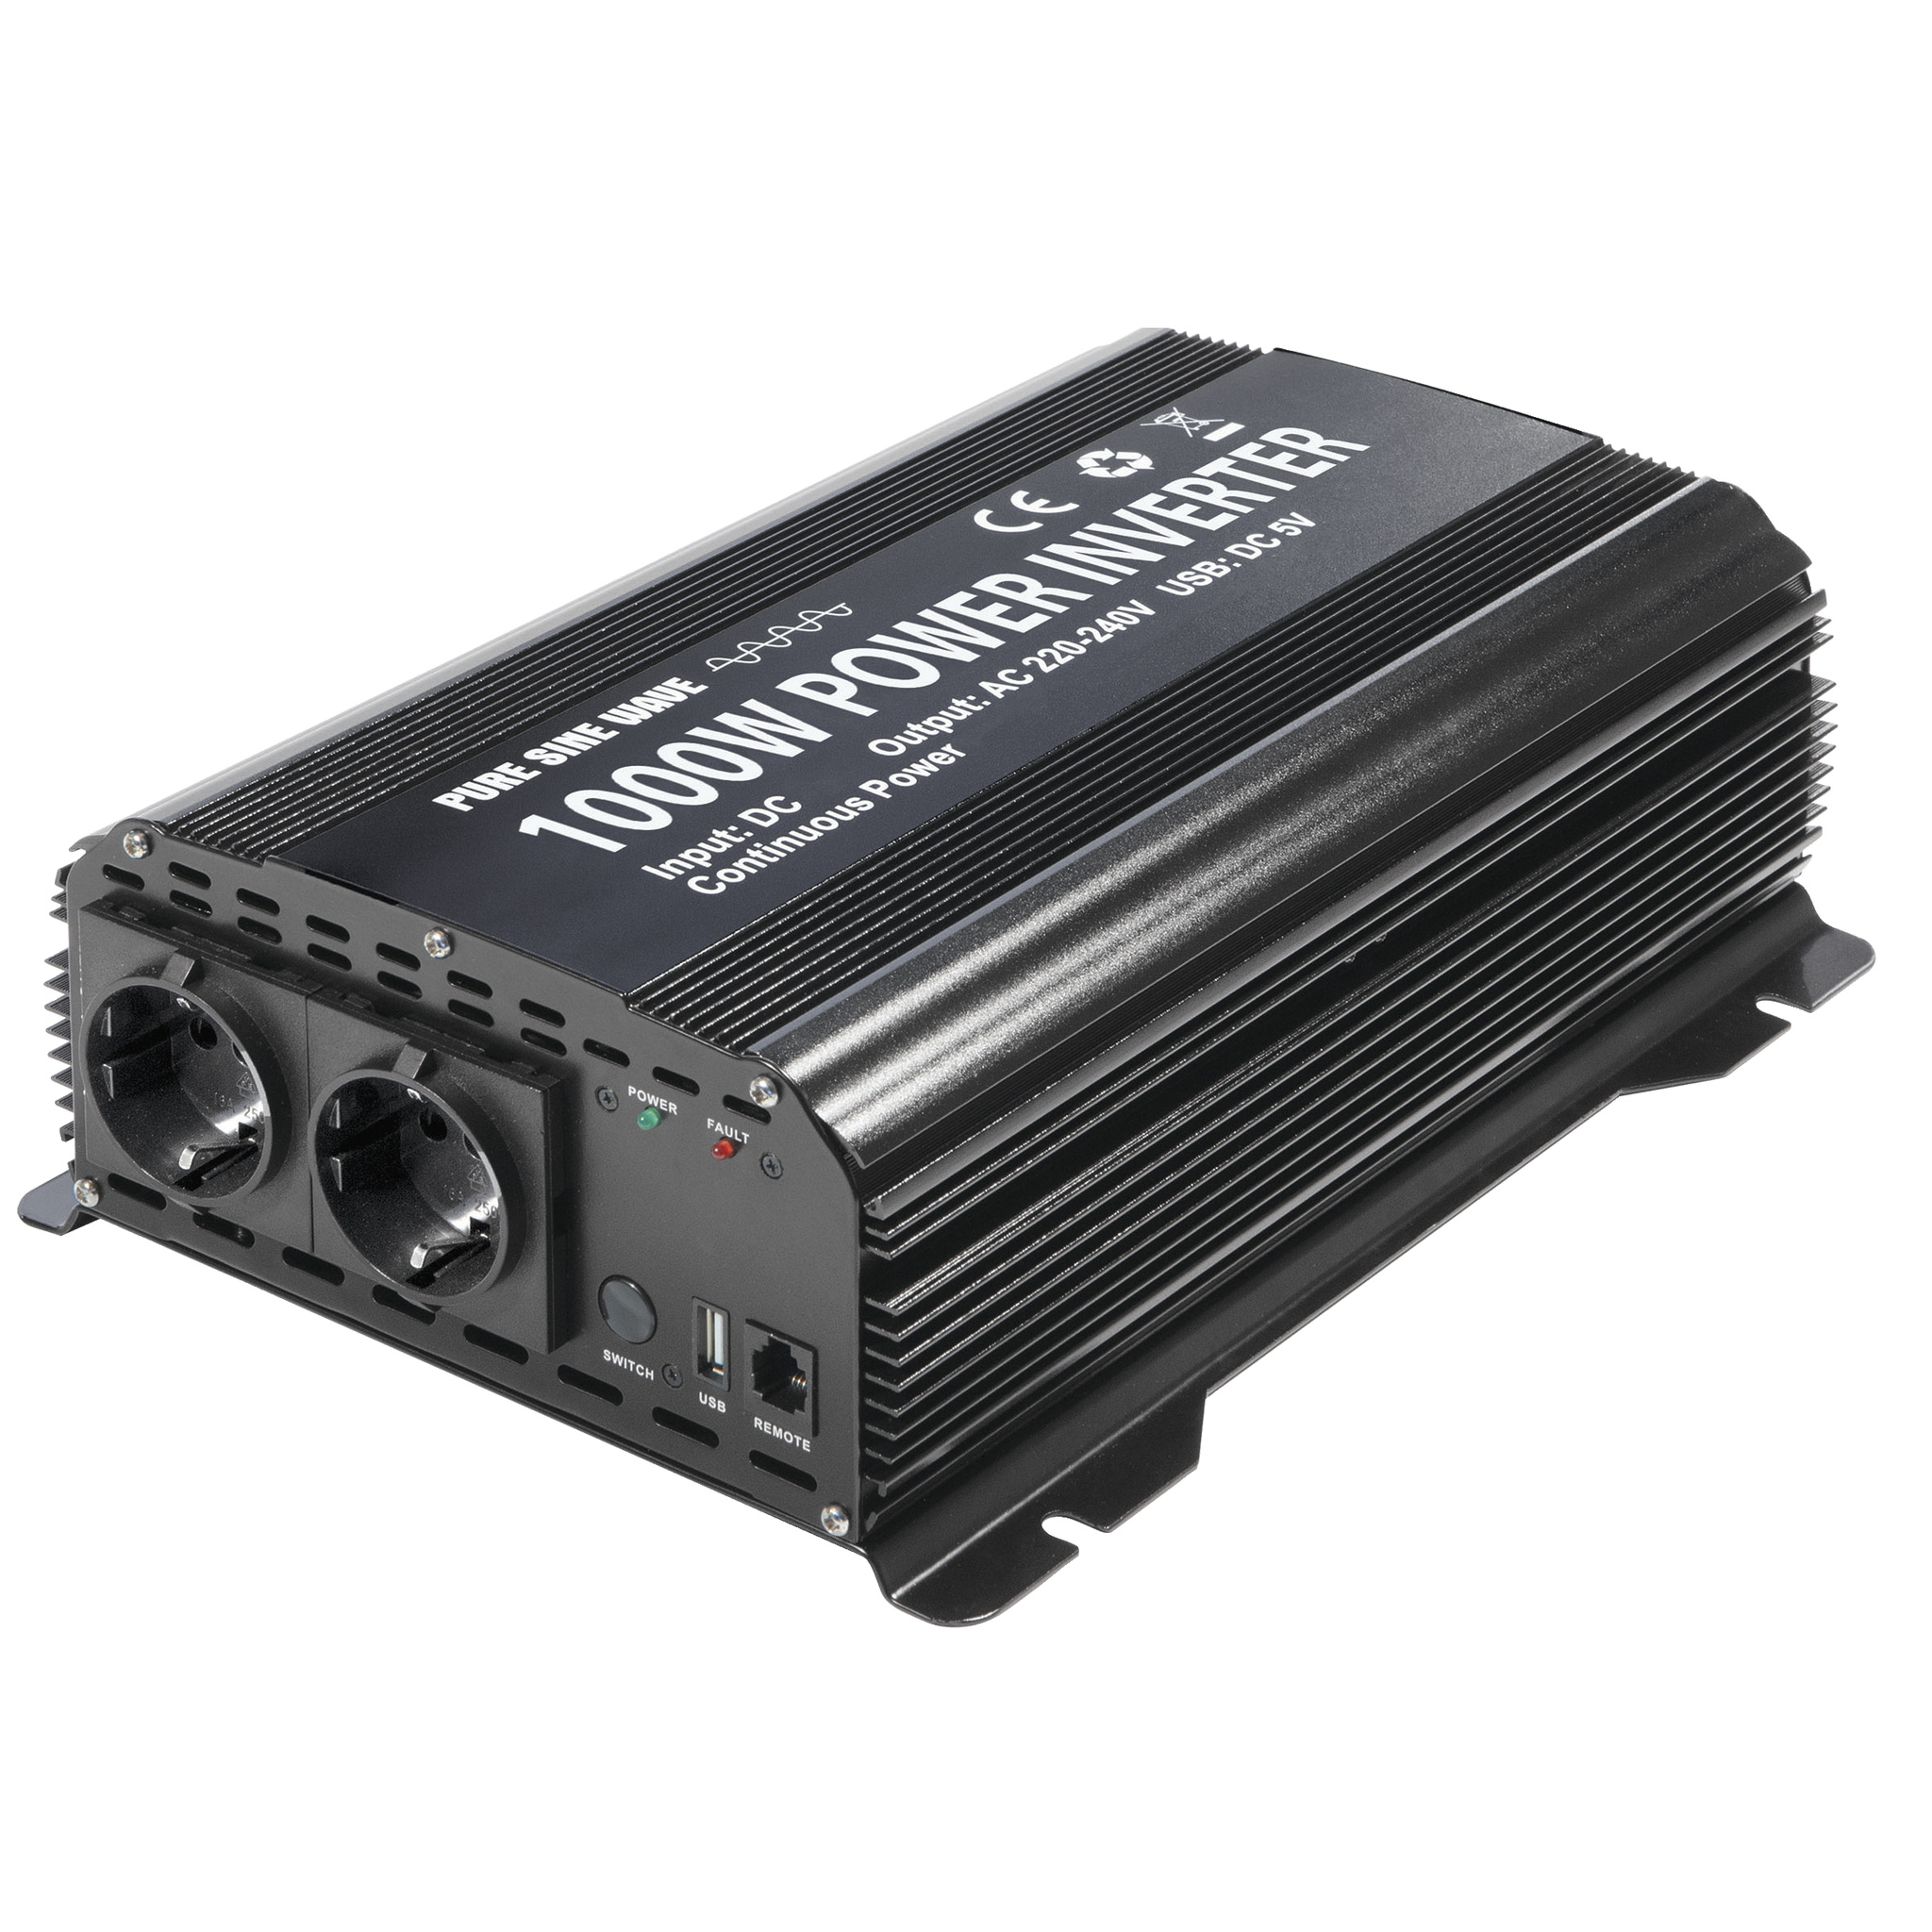 Omvormer-inverter PSW 1000W 12V